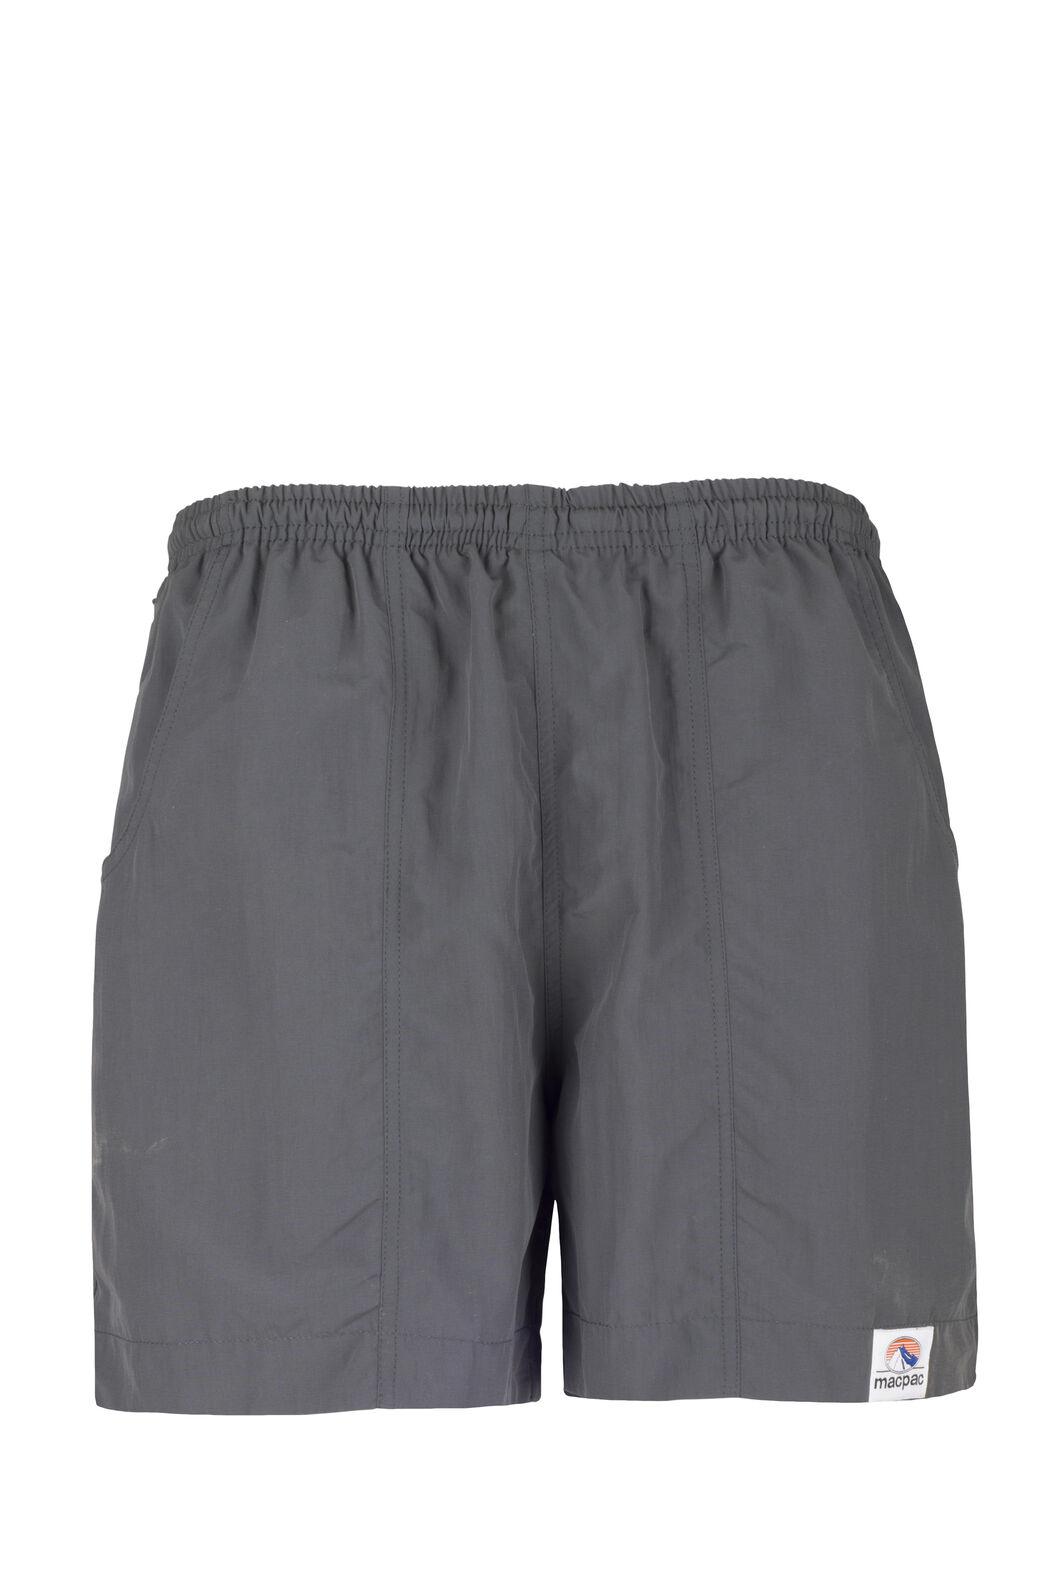 Macpac Winger Shorts - Men's, Asphalt, hi-res